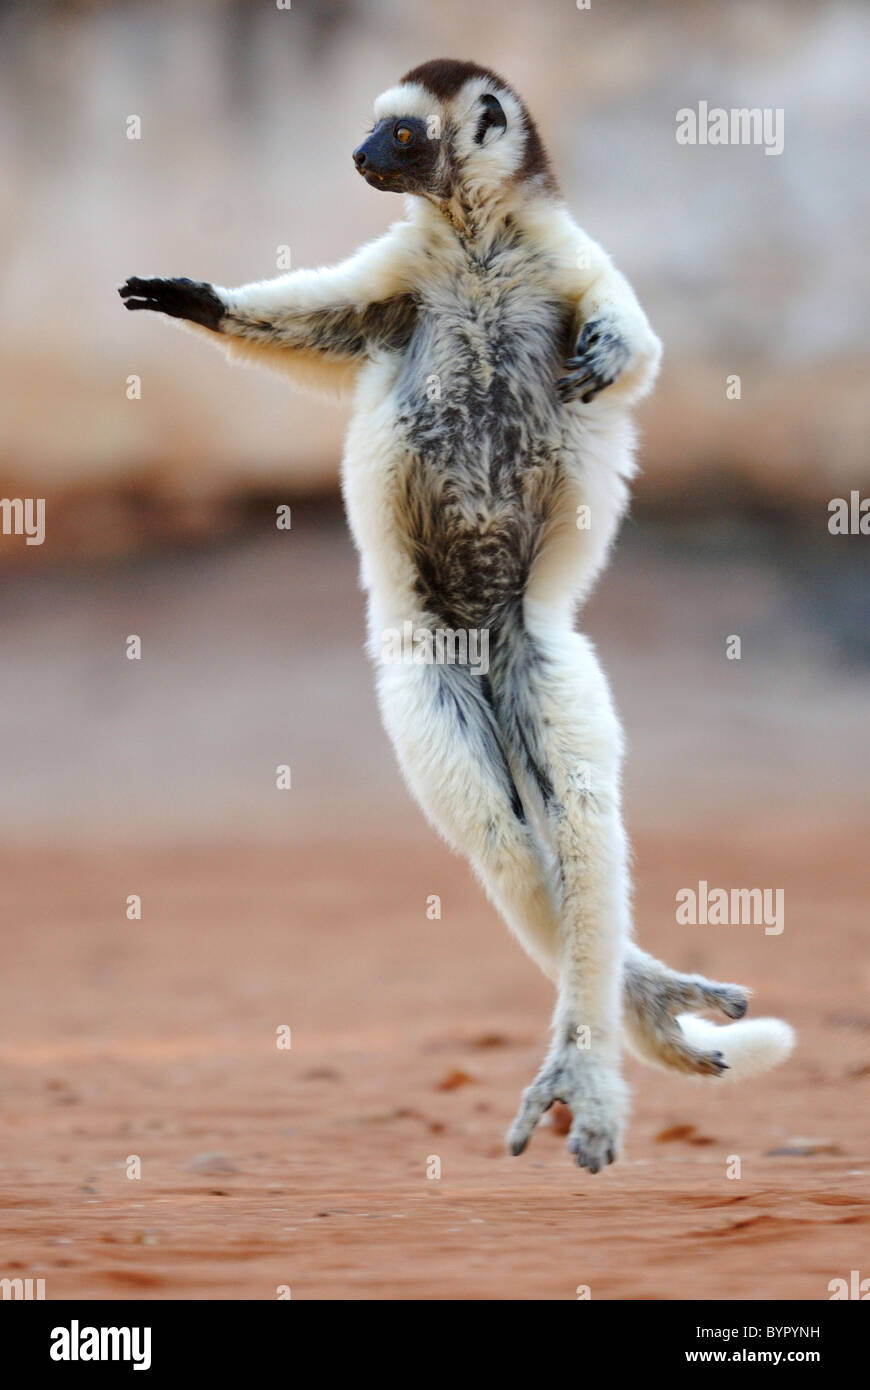 Verreaux's Sifaka (Propithecus verreauxi) bailando en Madagascar Imagen De Stock